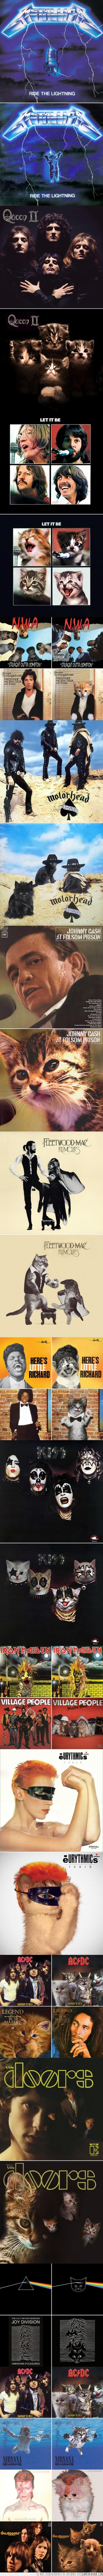 albumes,gatos,música